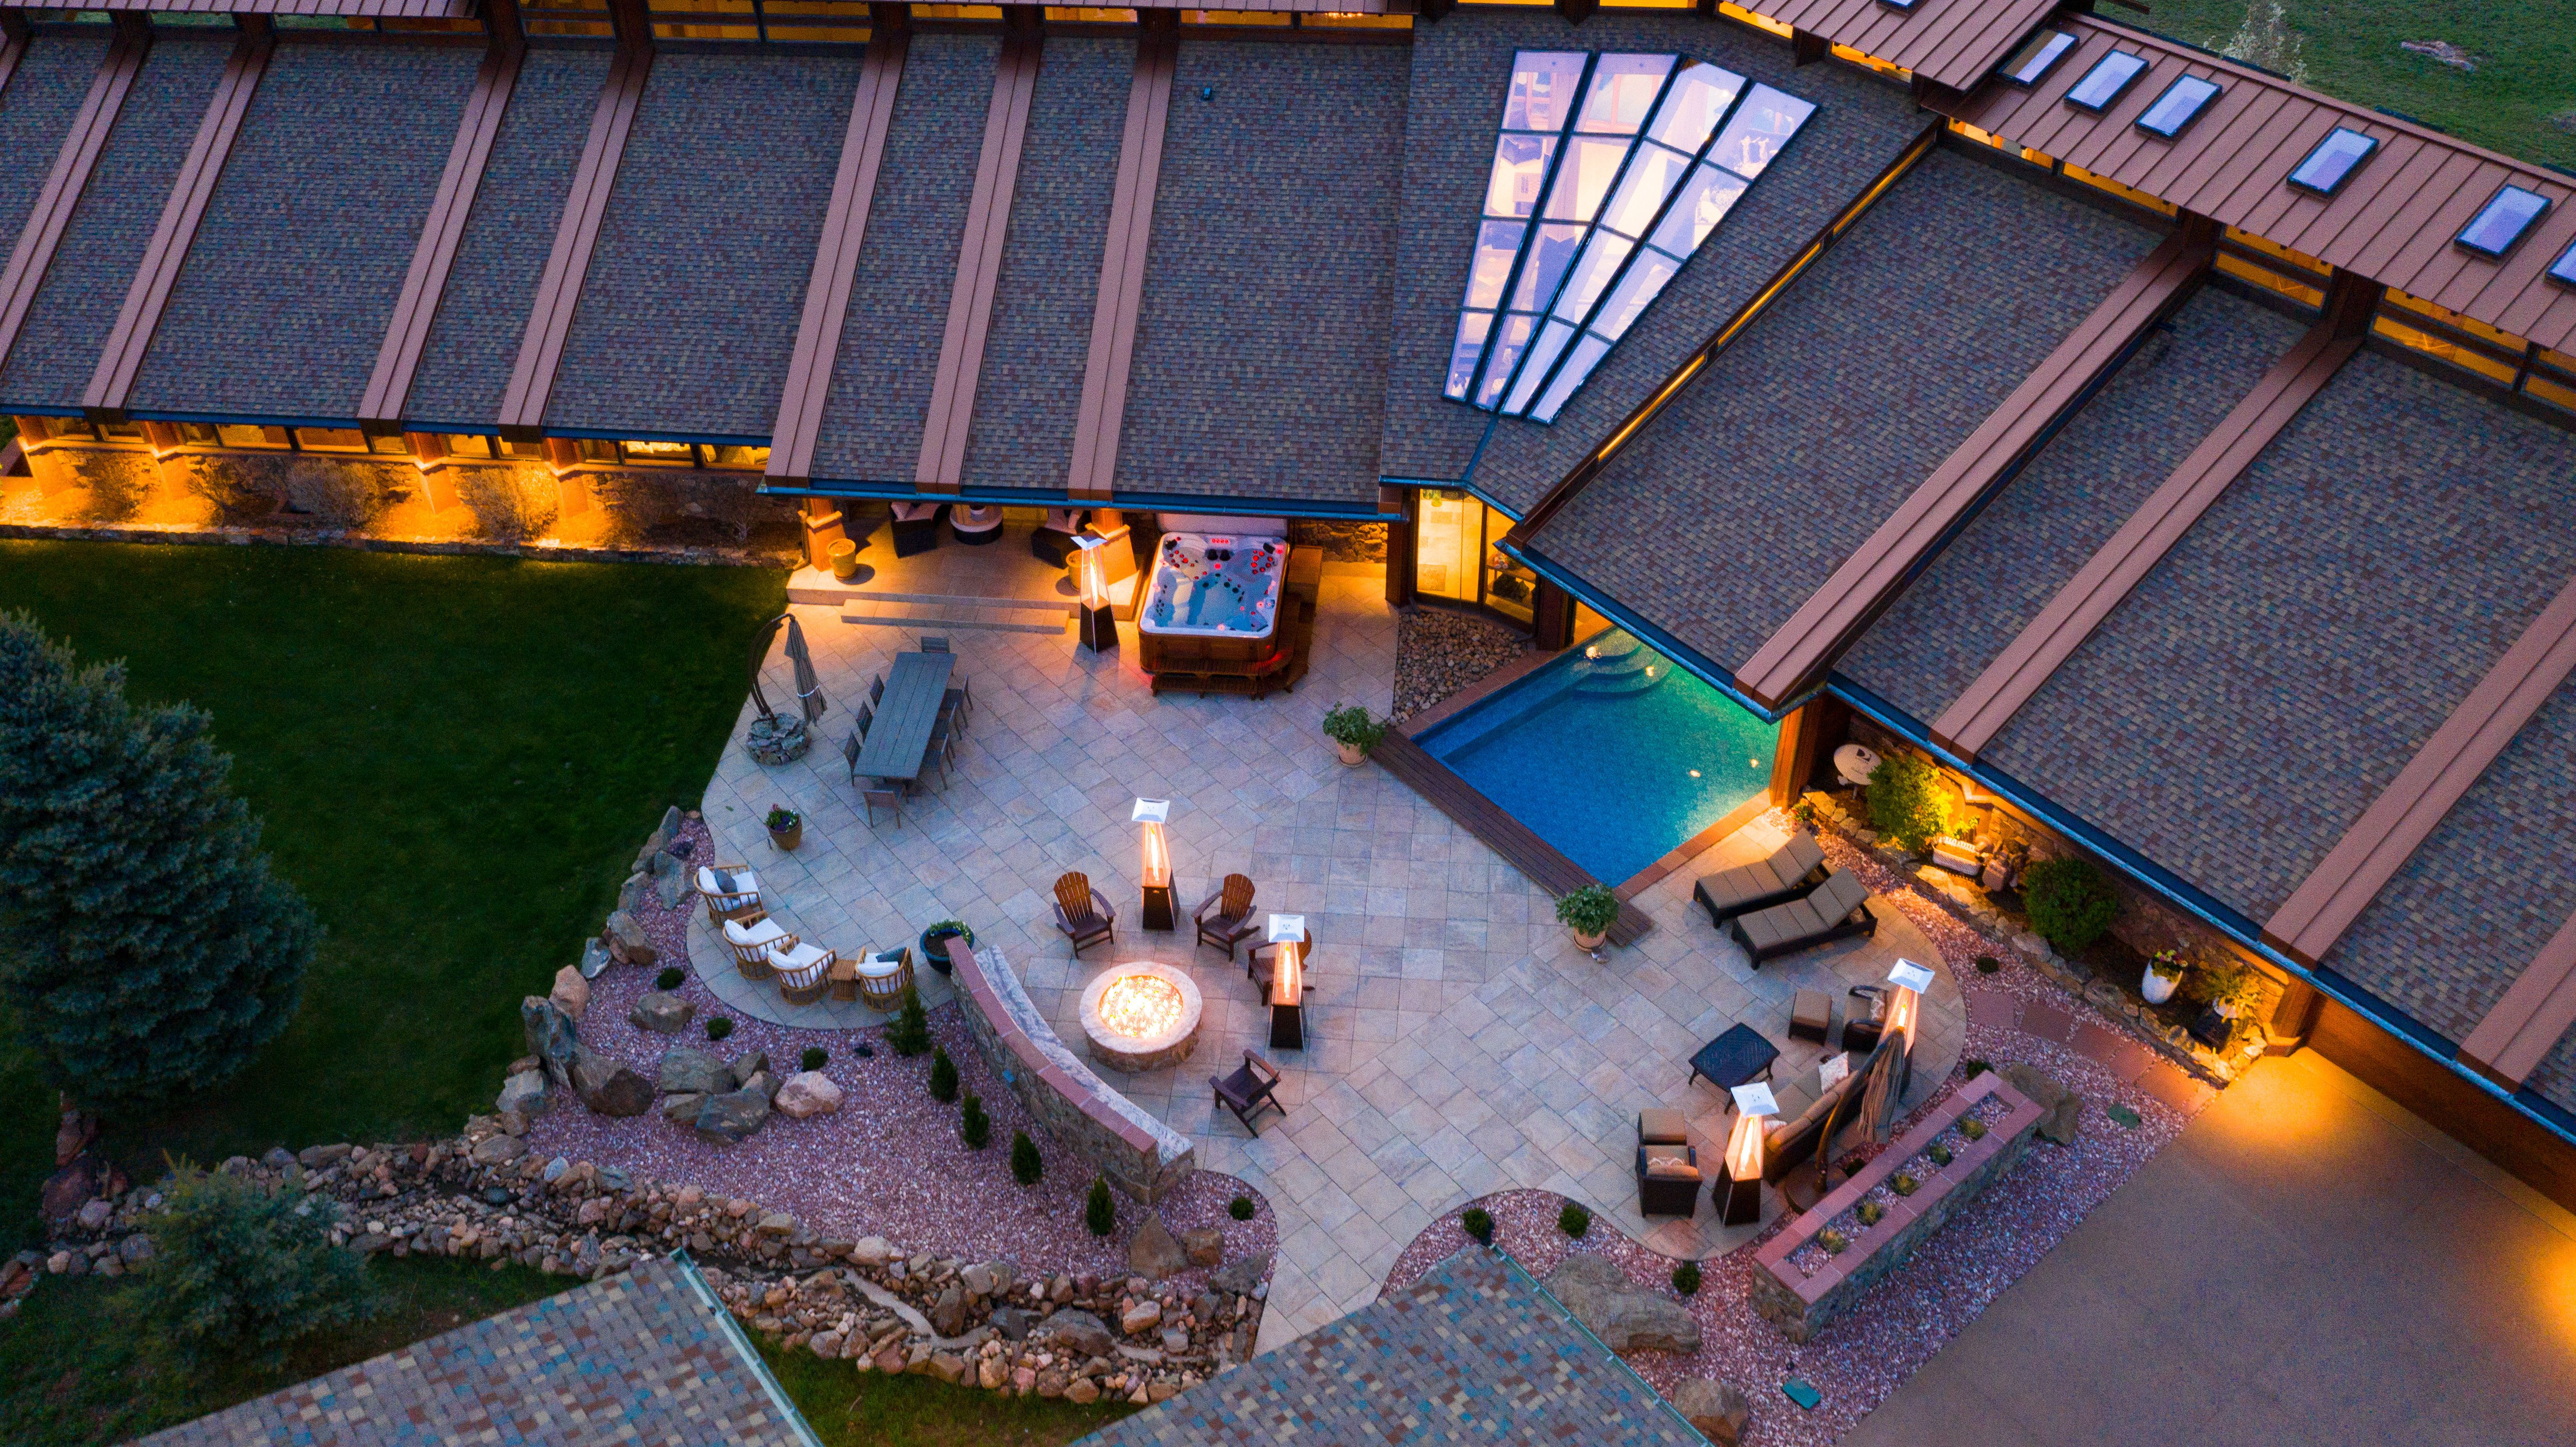 Colorado Mountain house on 35 acres asks $7M aerial view